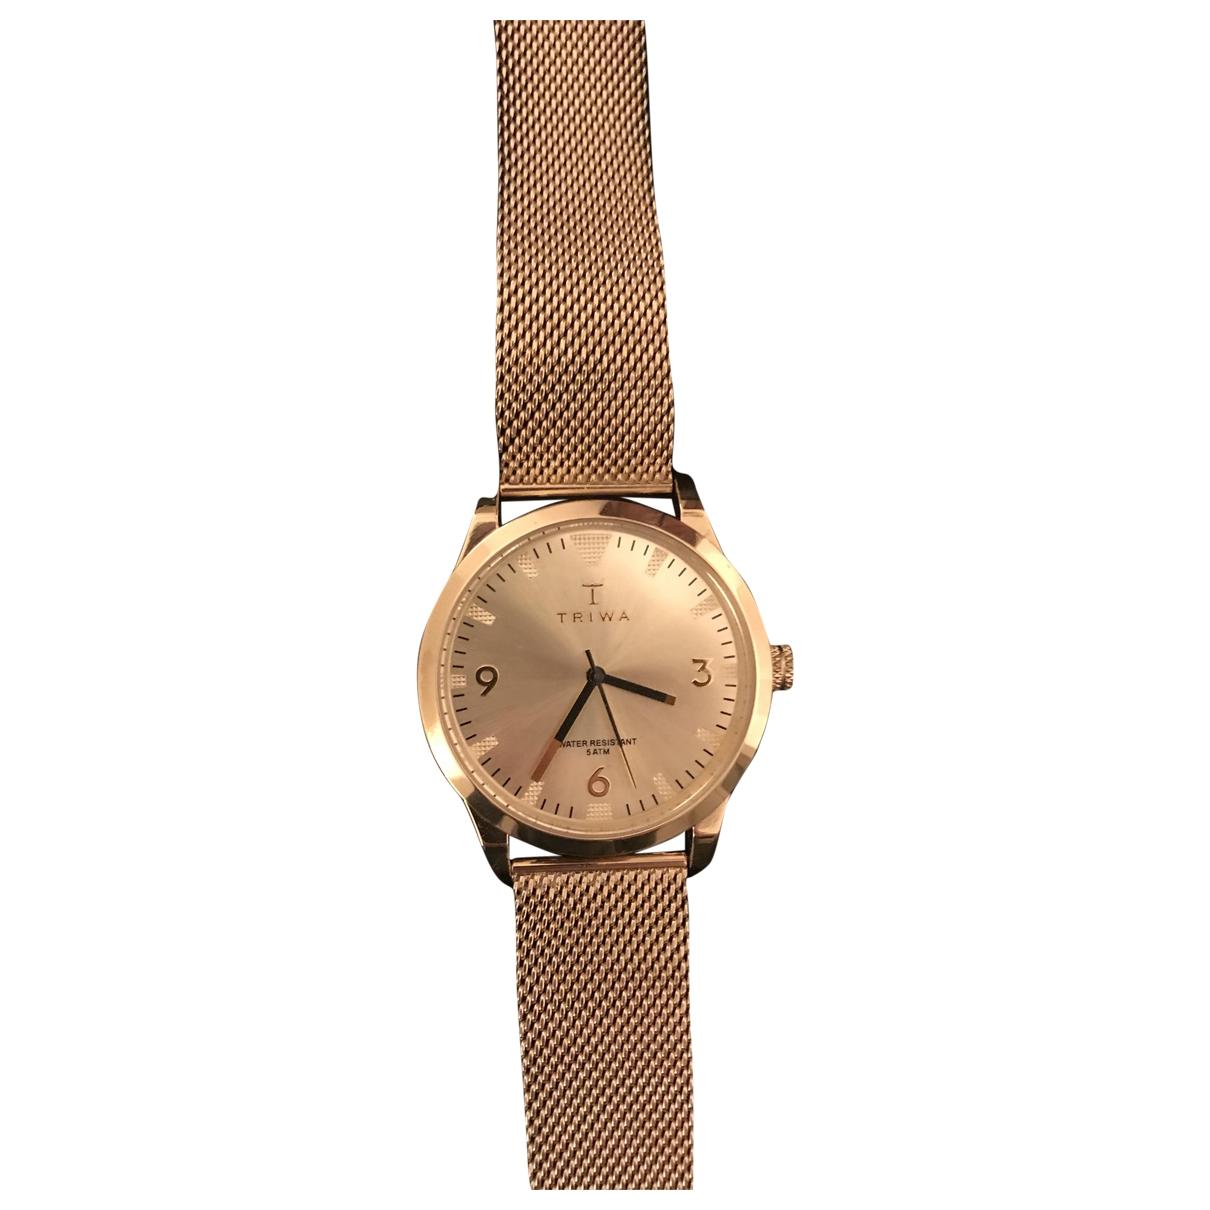 Reloj Triwa